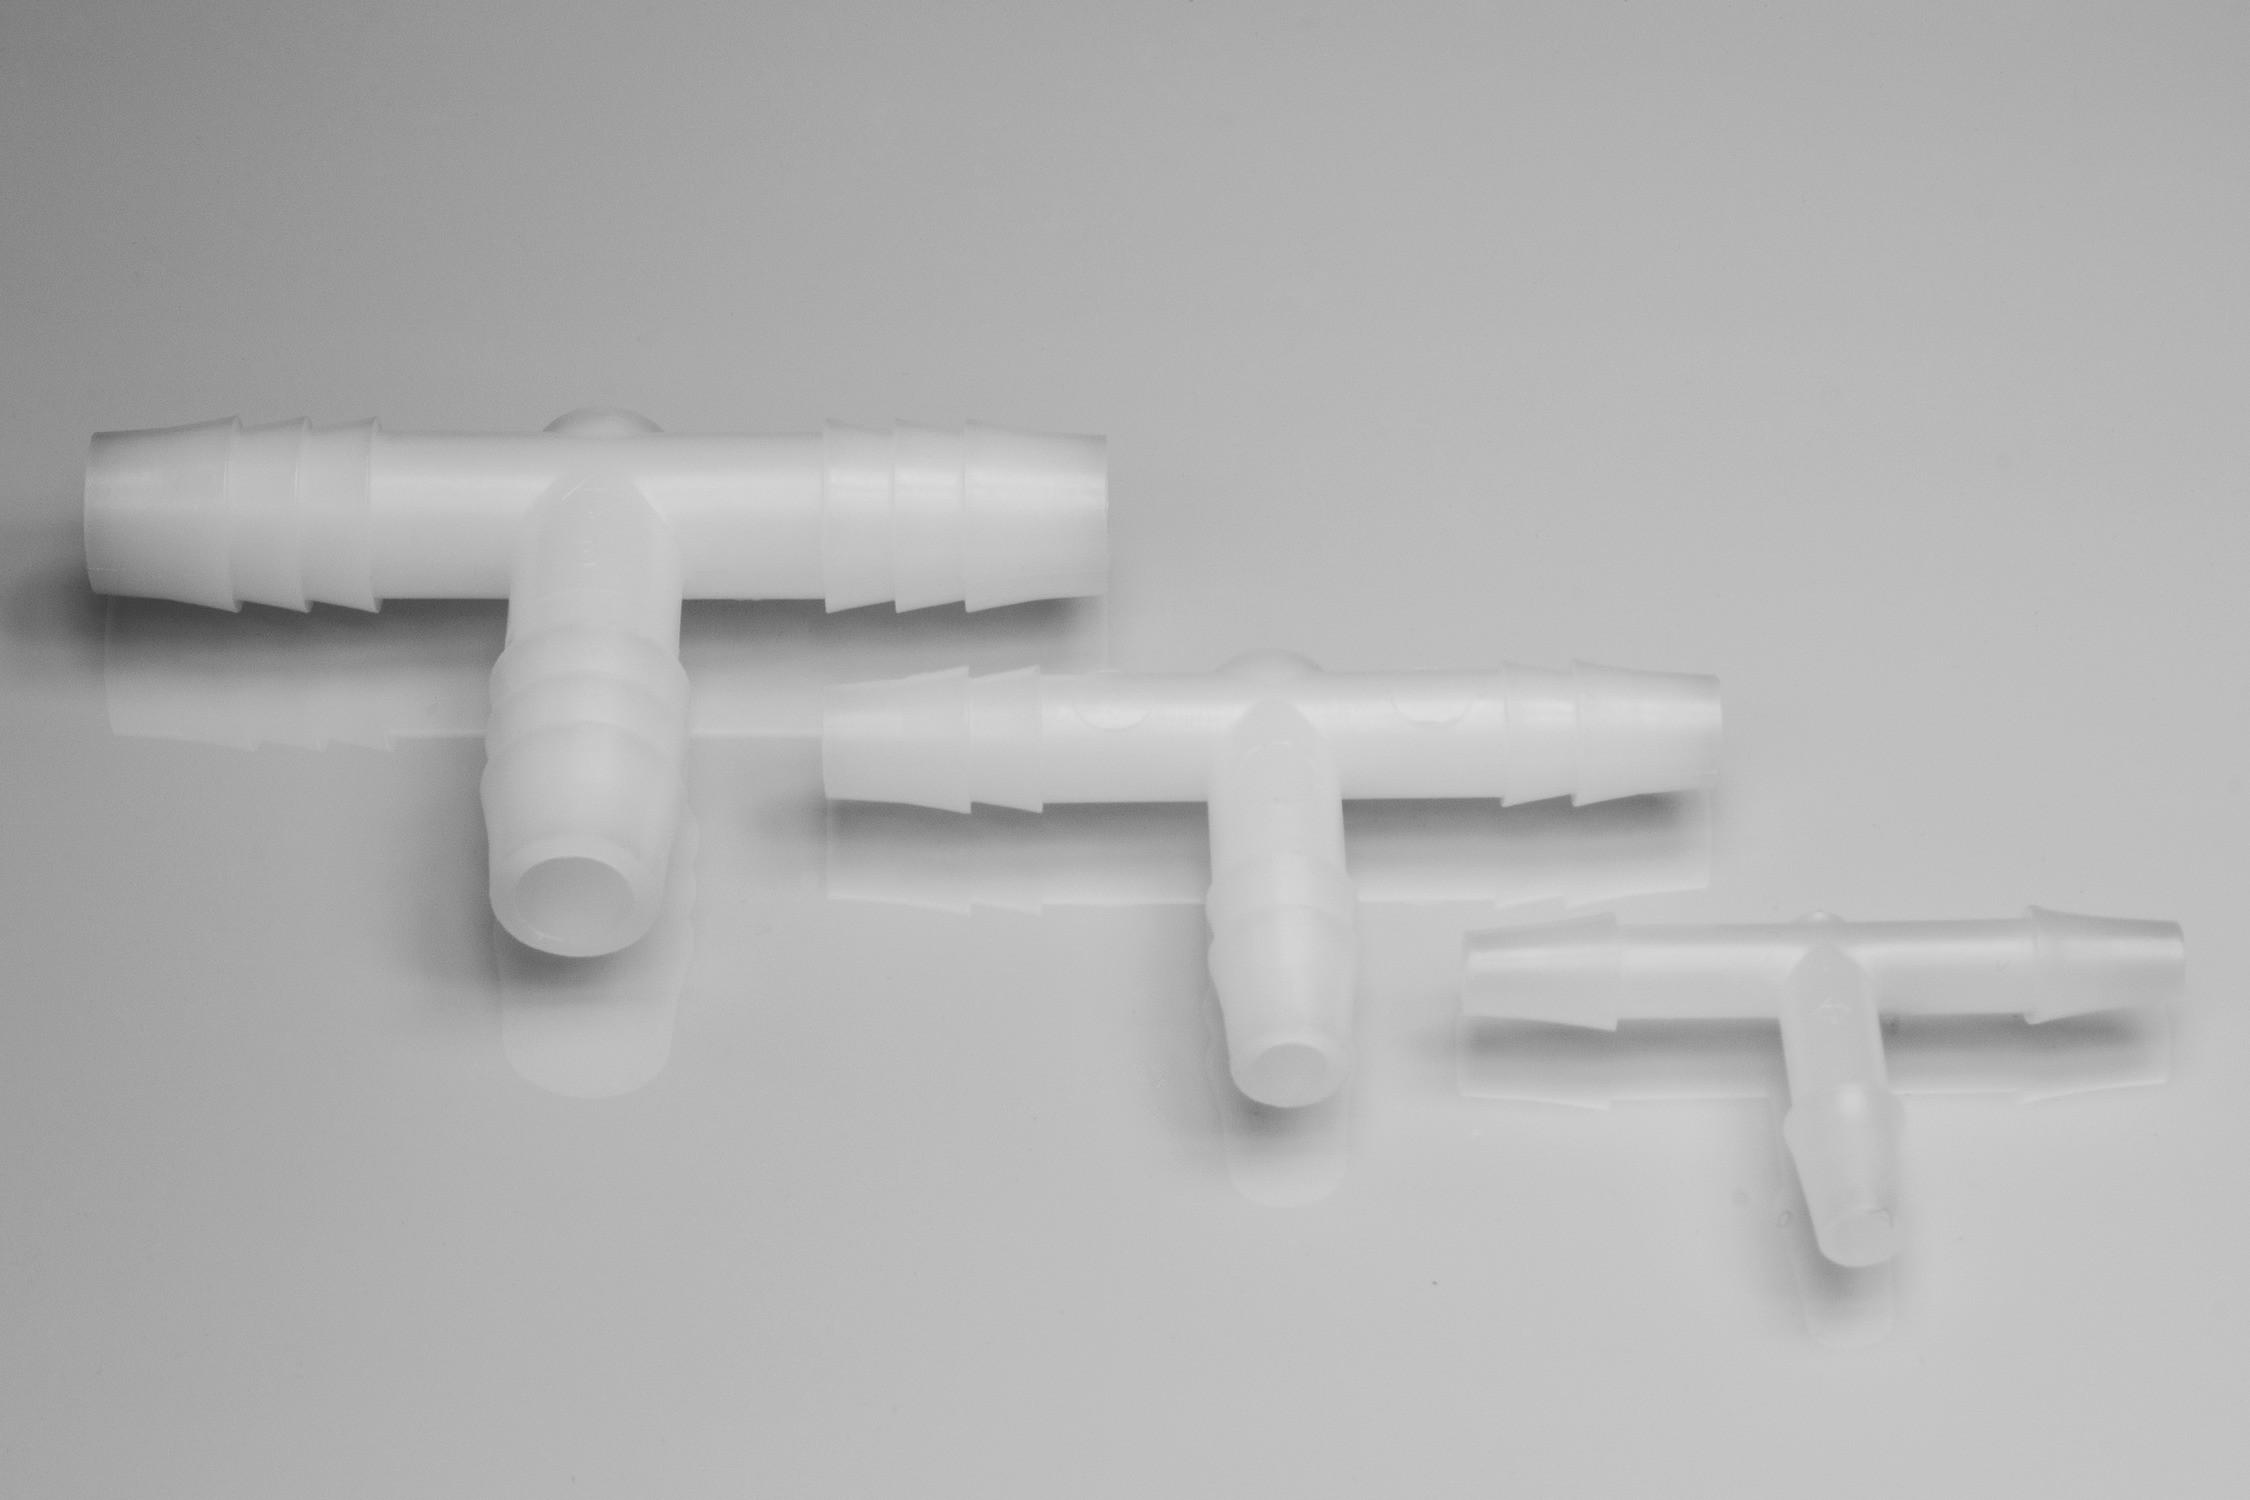 """T"" Shaped Tubing Connectors"